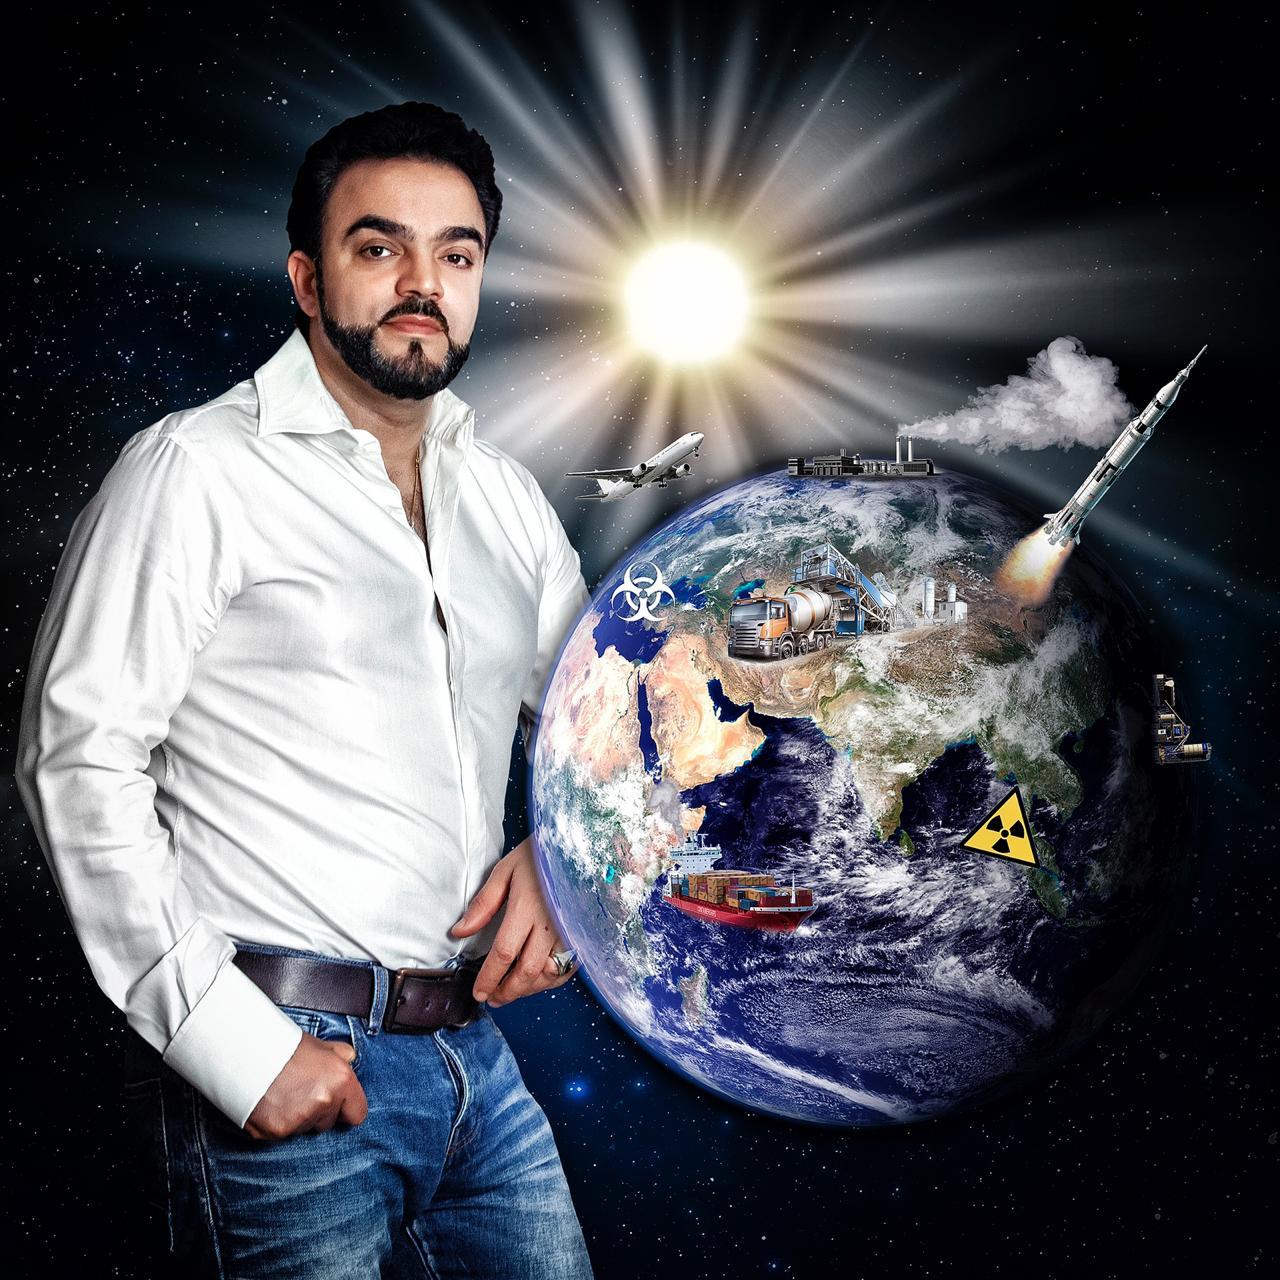 Человечество: предназначение и будущее. Мехди Эбрагими Вафа